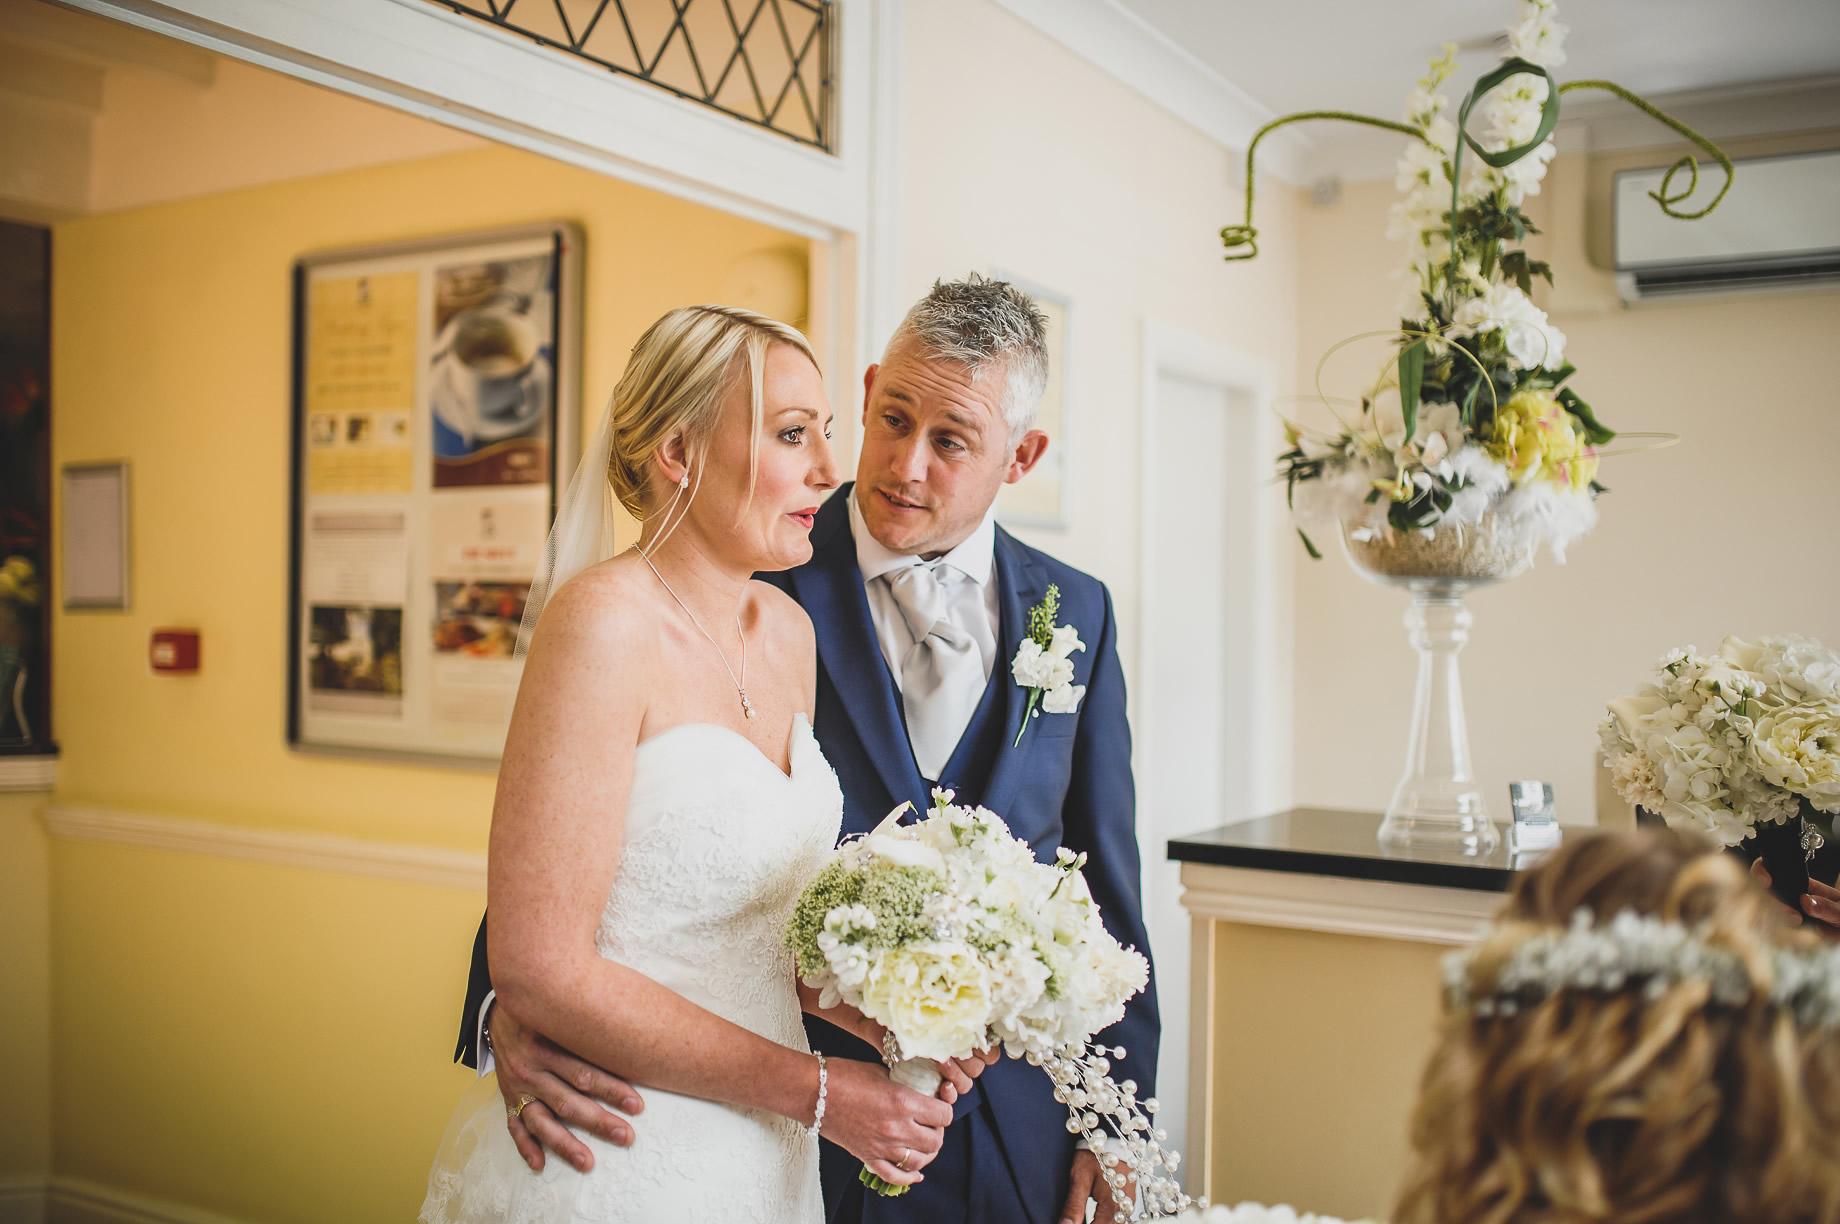 Rachel and Christian's Wedding at Holland Hall Hotel 083